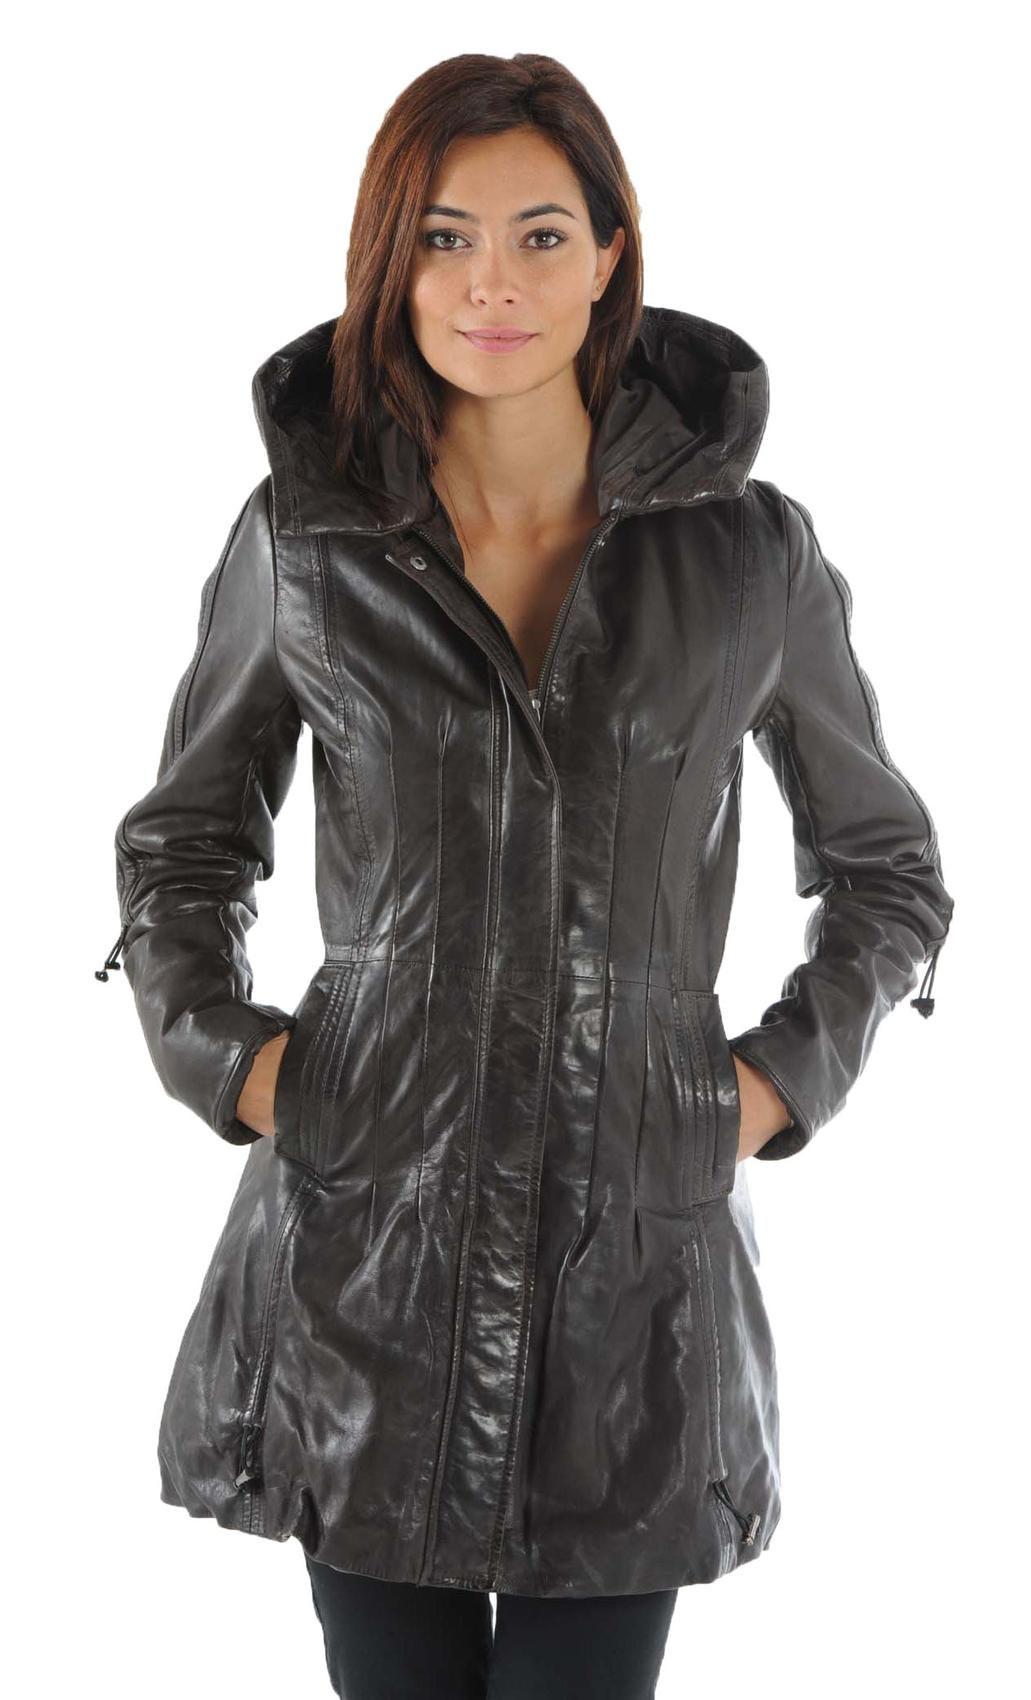 manteau femme en cuir souple. Black Bedroom Furniture Sets. Home Design Ideas